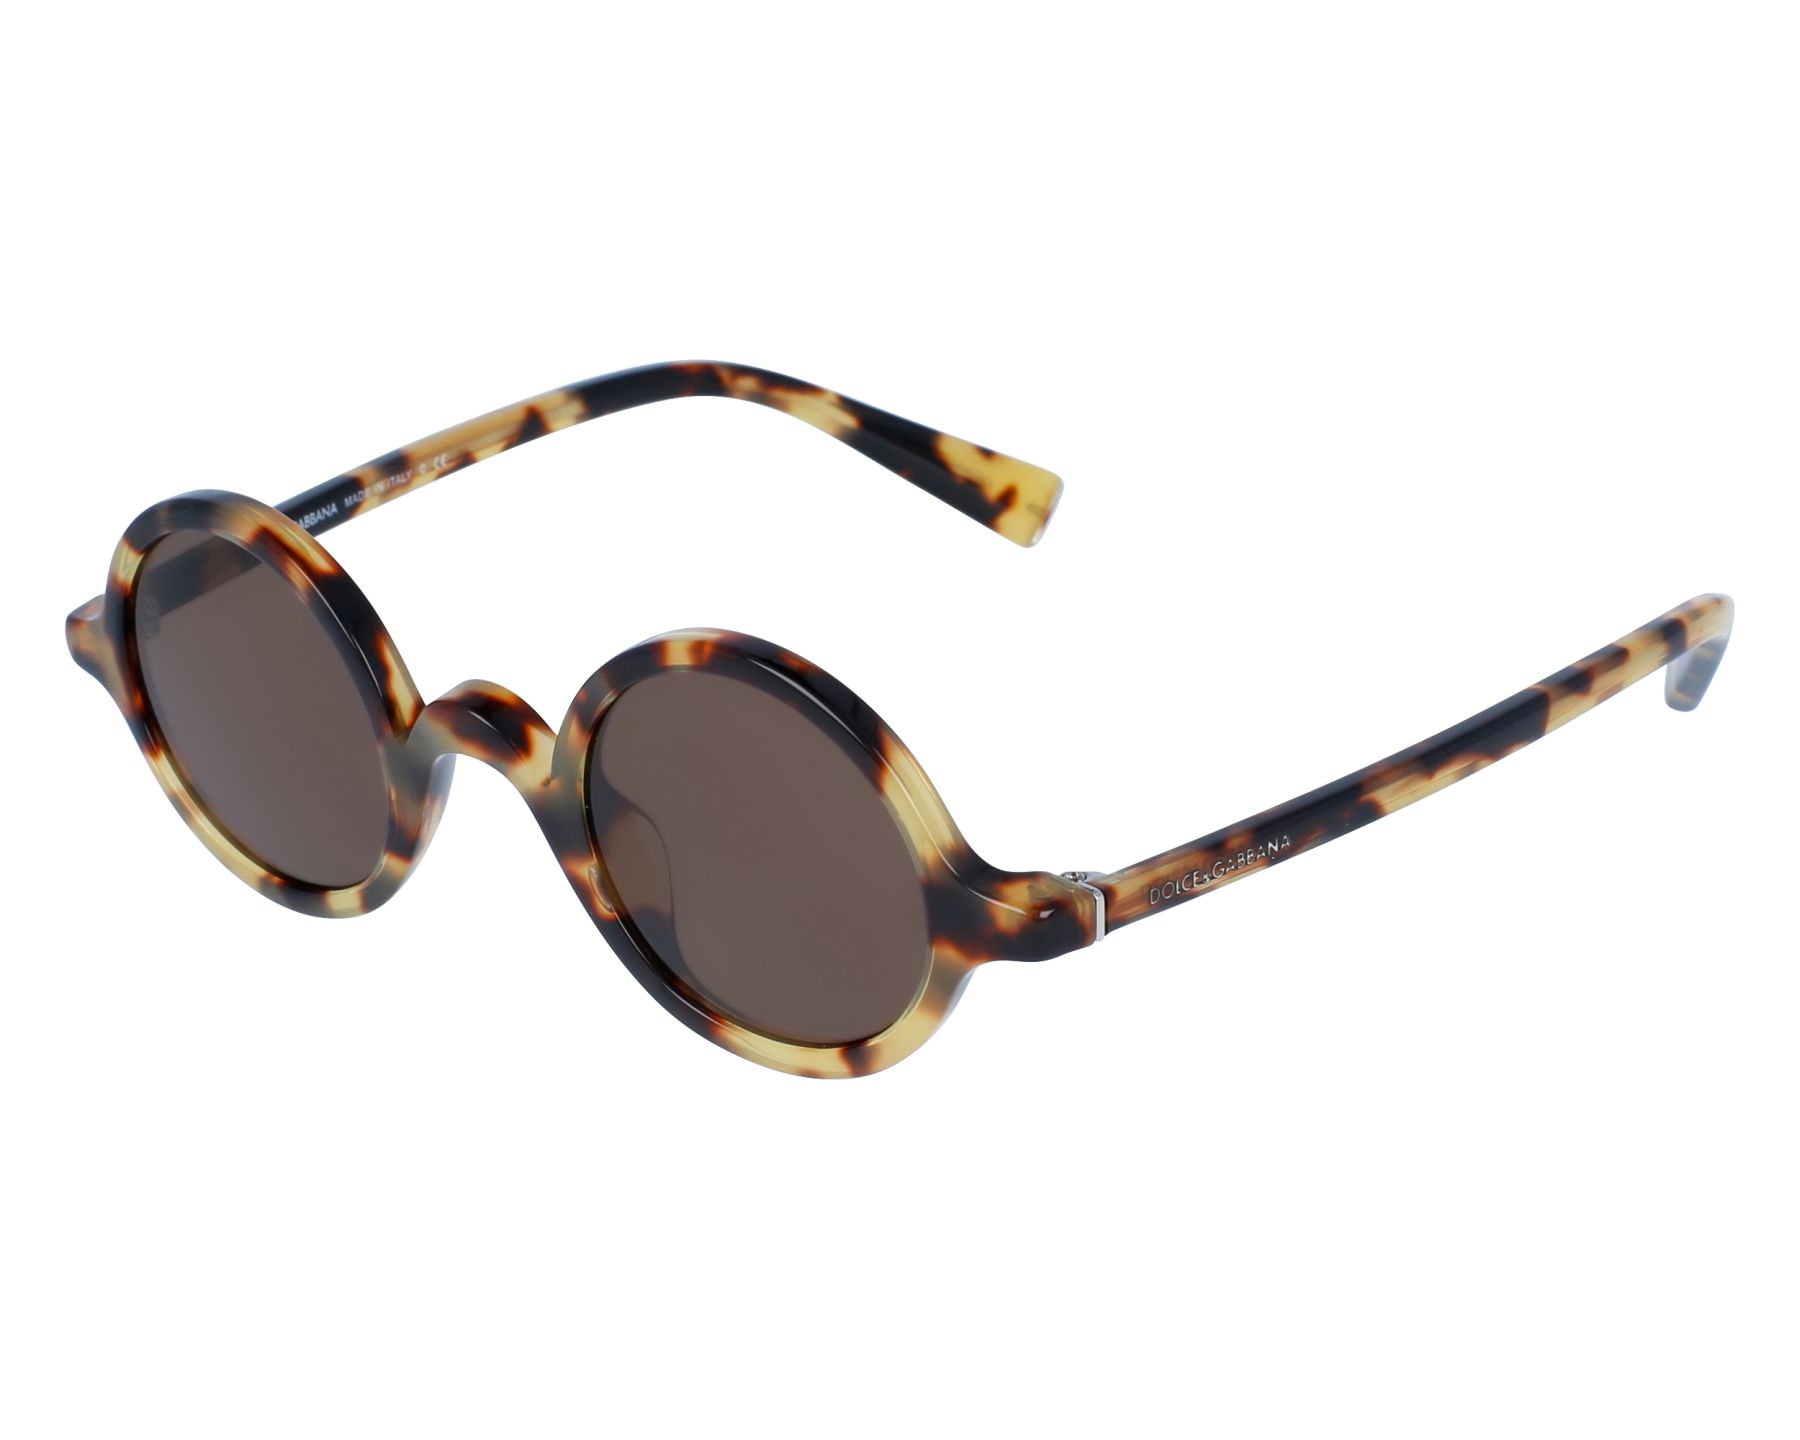 Dolce Gabbana 4303/501/87 hyoHXJzC